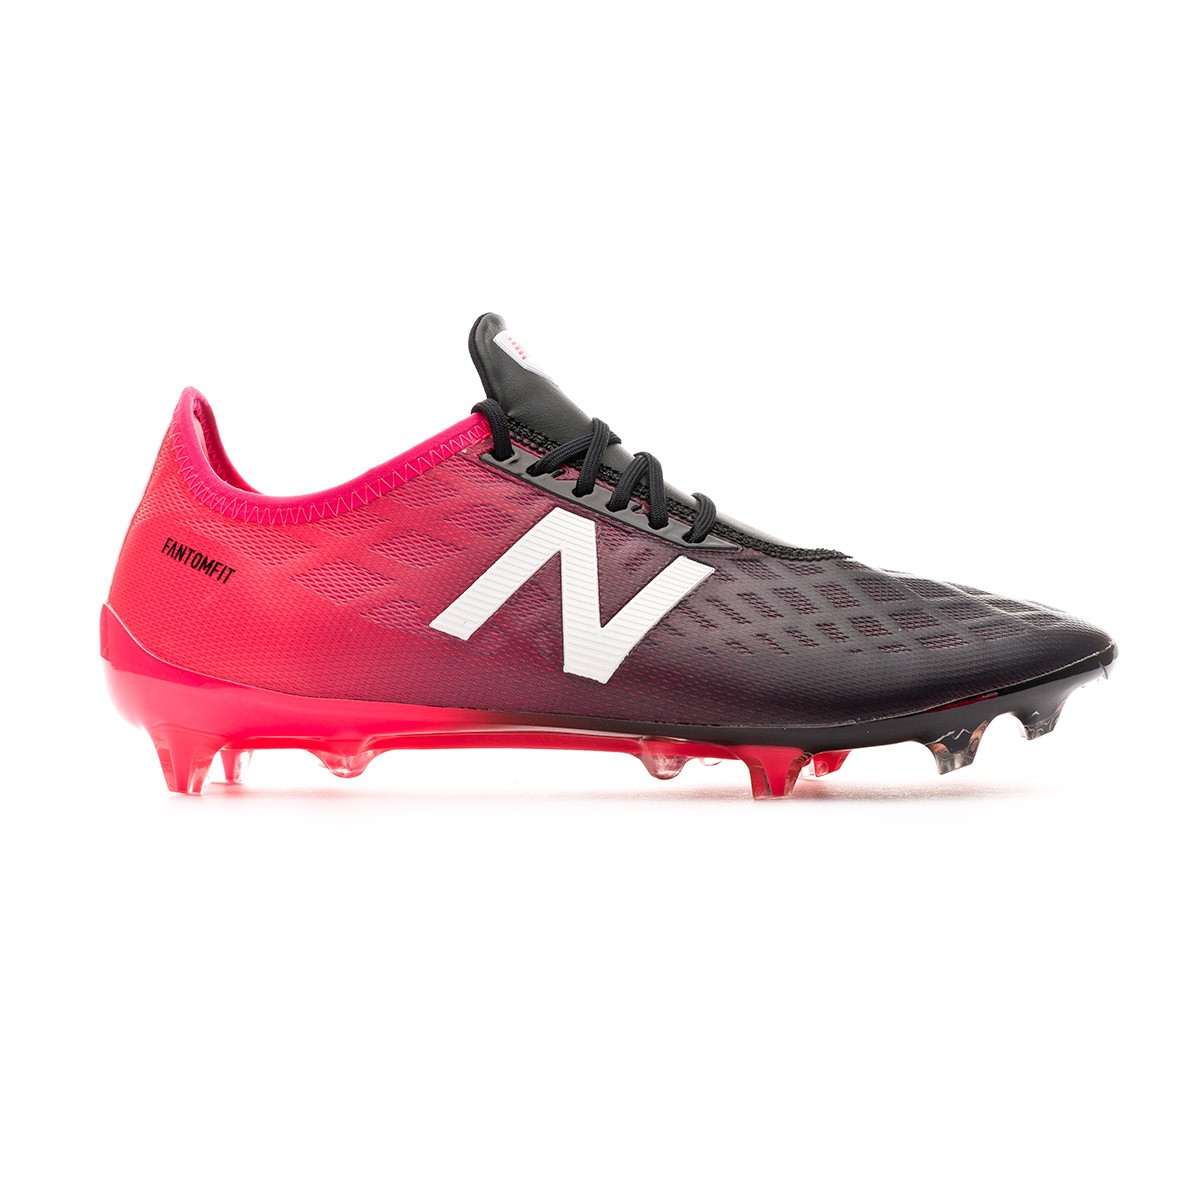 2389ee51e Football Boots New Balance Furon 4.0 Pro FG Bright cherry - Tienda de  fútbol Fútbol Emotion